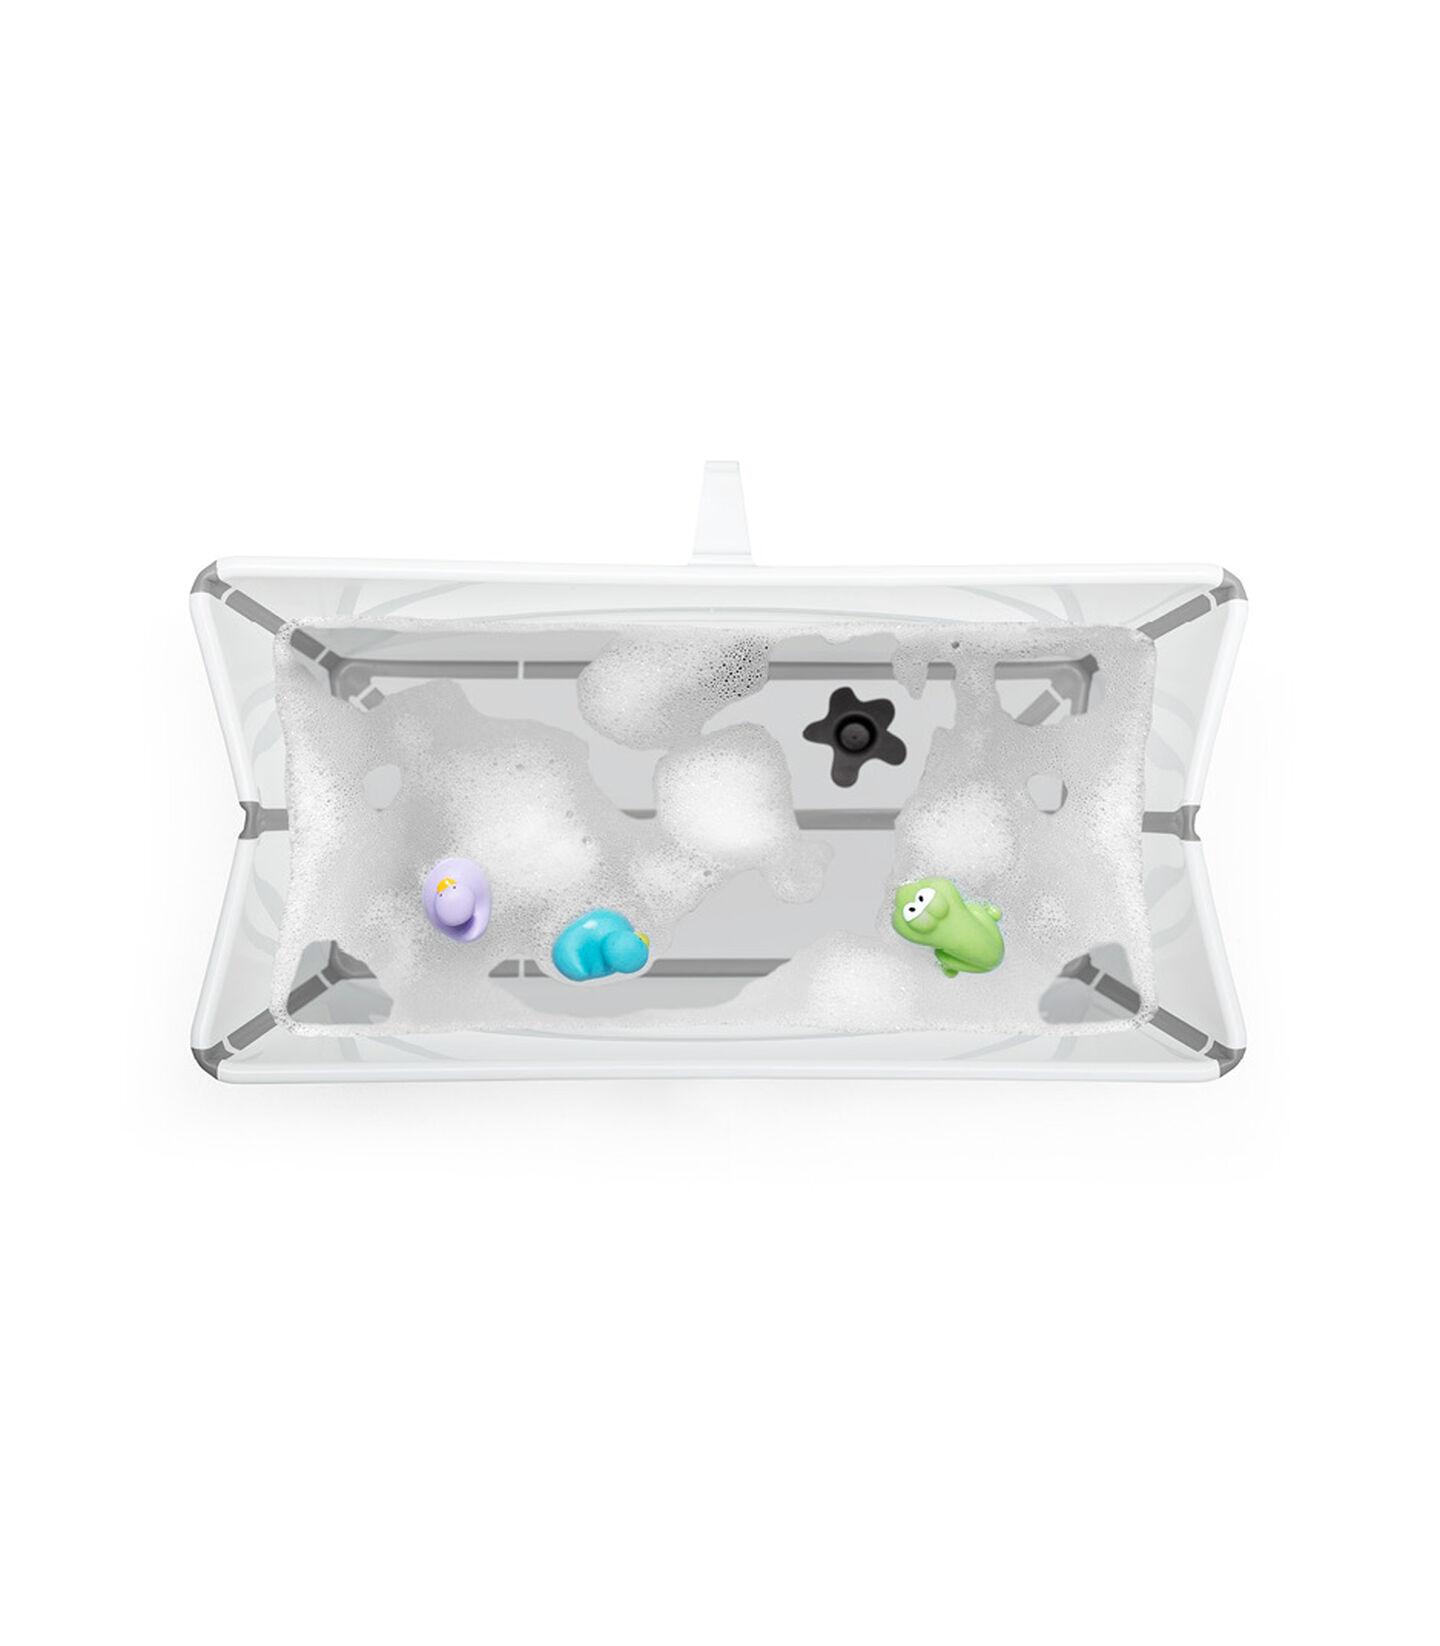 Stokke® Flexi Bath ® Large White, Bianco, mainview view 3